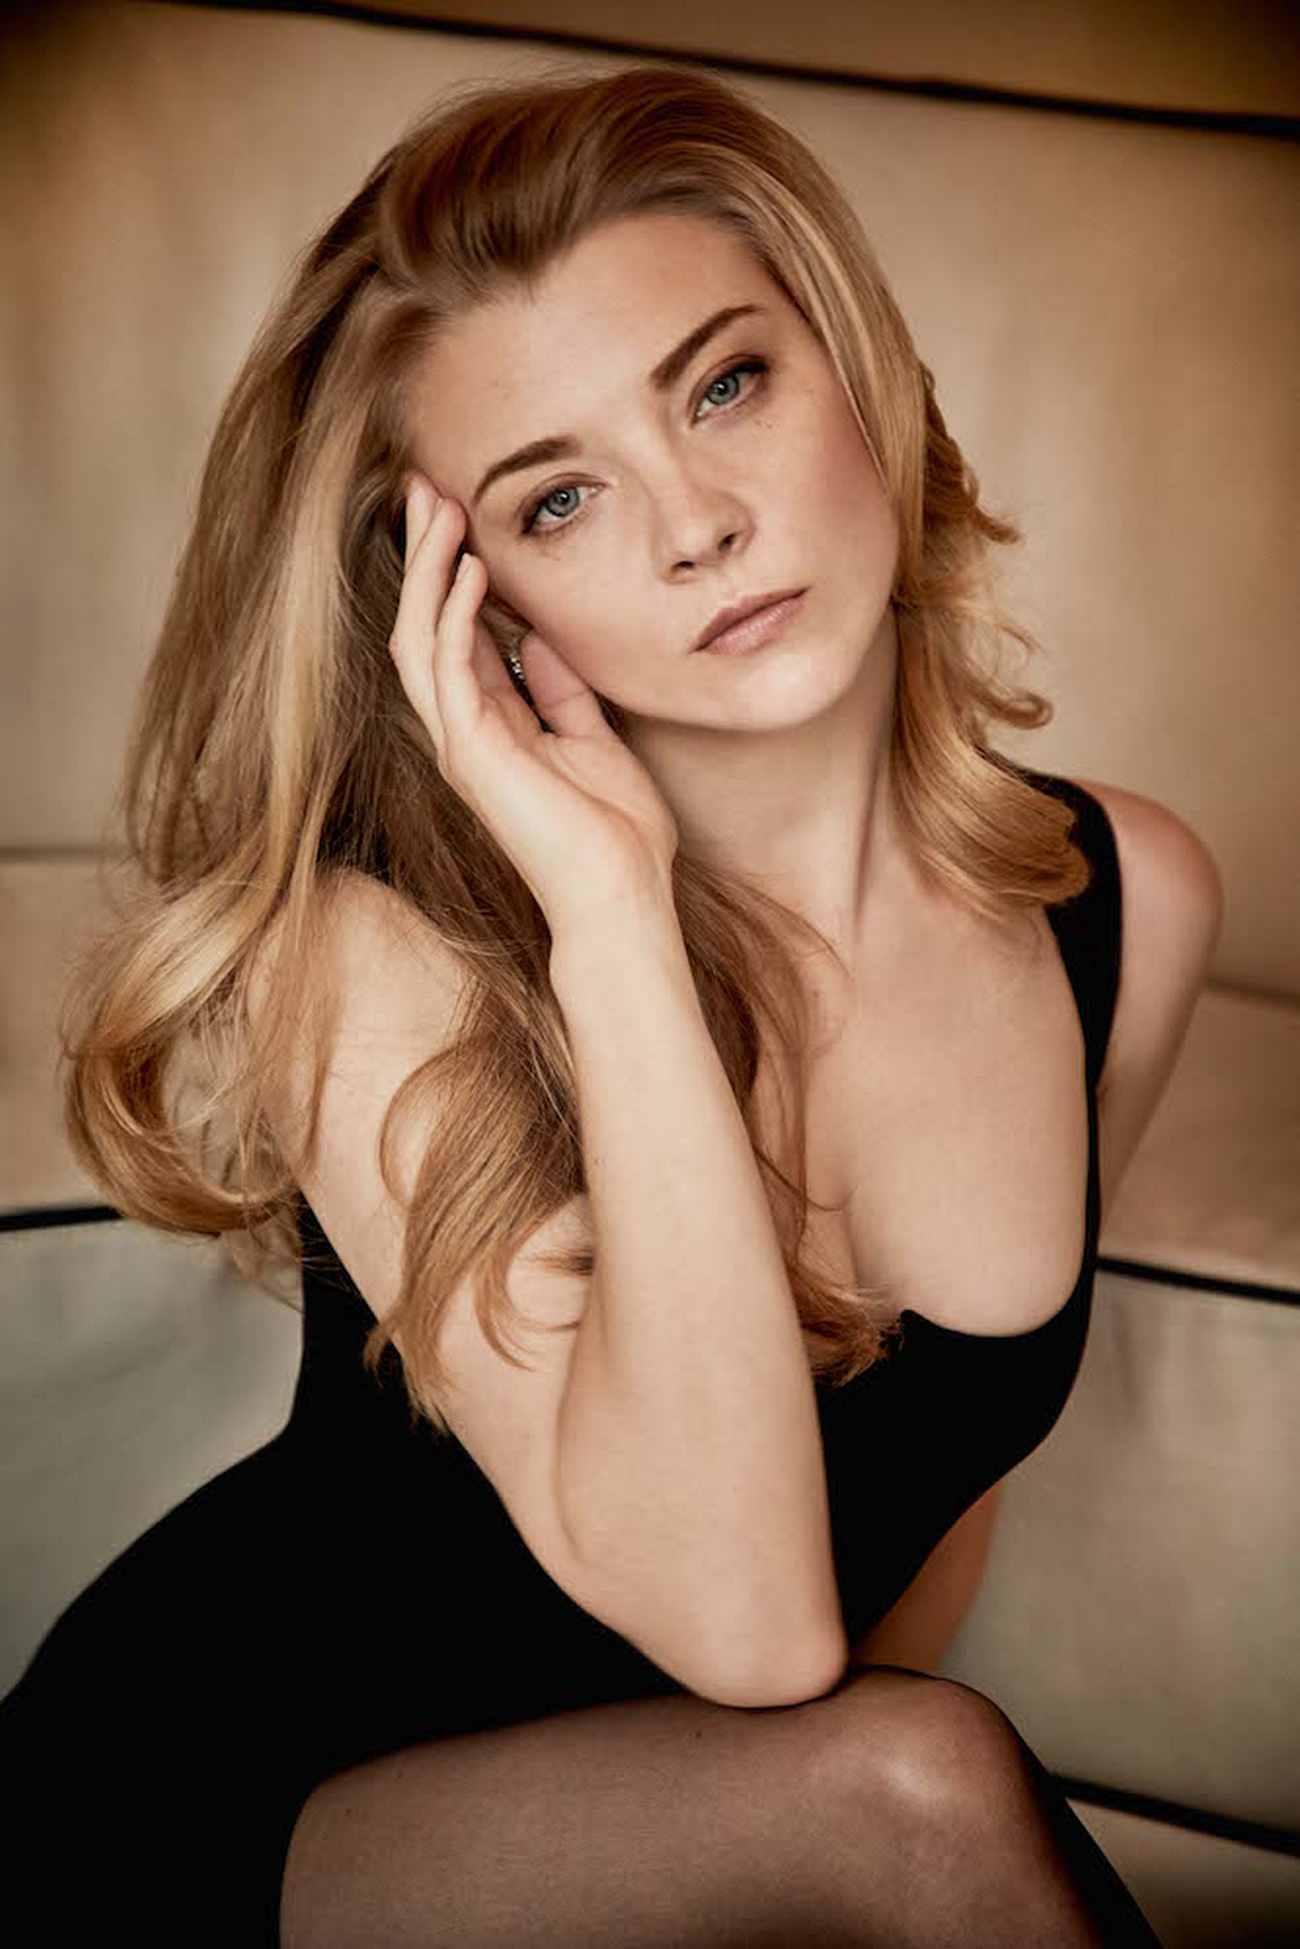 Natalie-Dormer-Interview-May-201800003.jpg